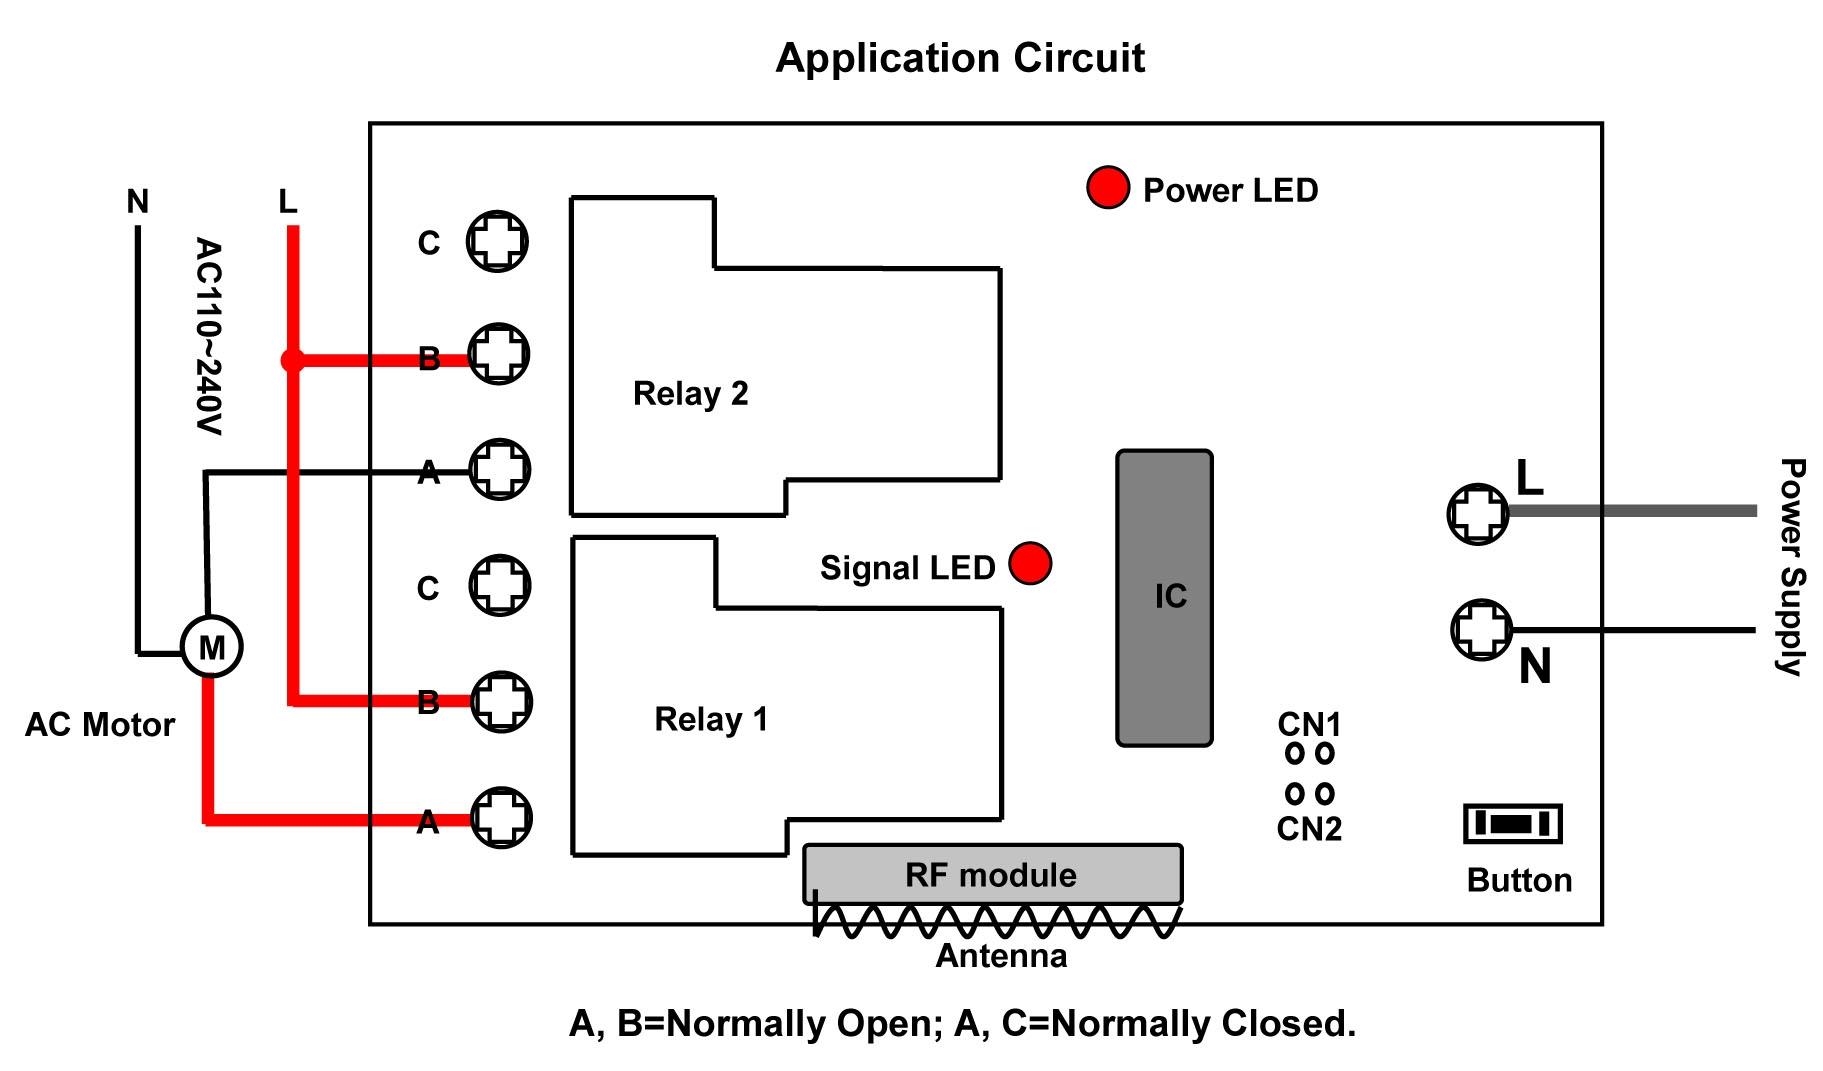 hight resolution of bridgeport series 2 wiring diagram bridgeport mill wiring diagram unique 2 5d to brushless dc